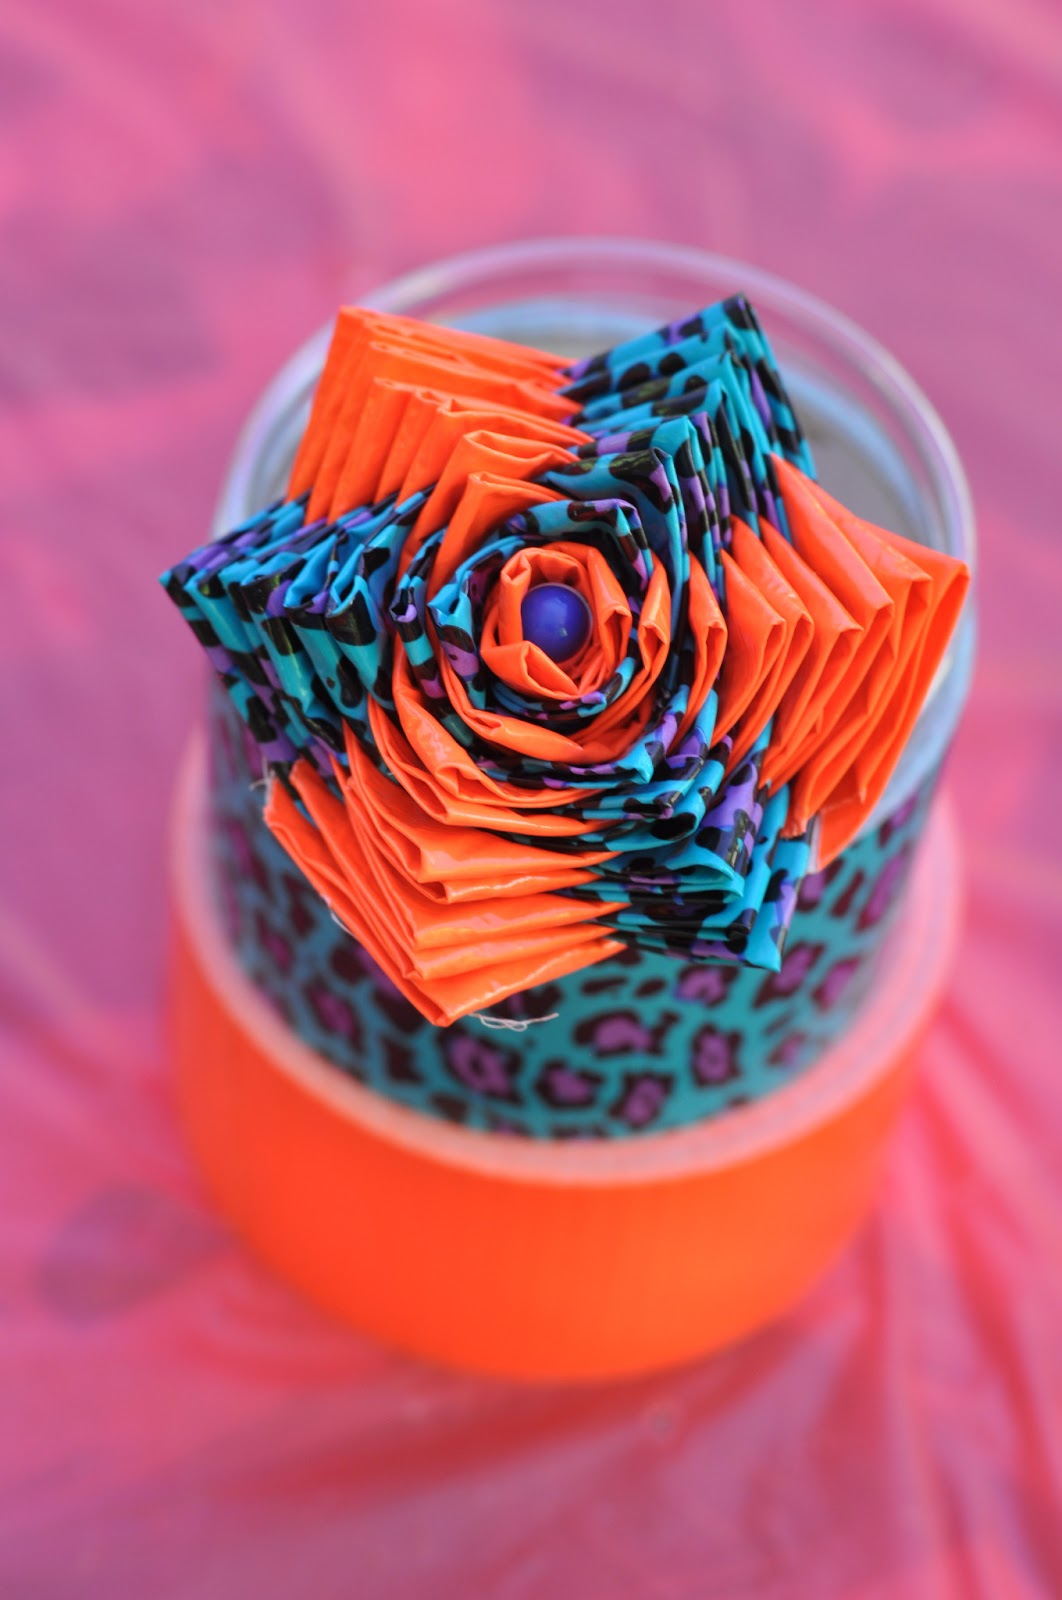 duct tape girls camp crafts ideas little birdie secrets. Black Bedroom Furniture Sets. Home Design Ideas